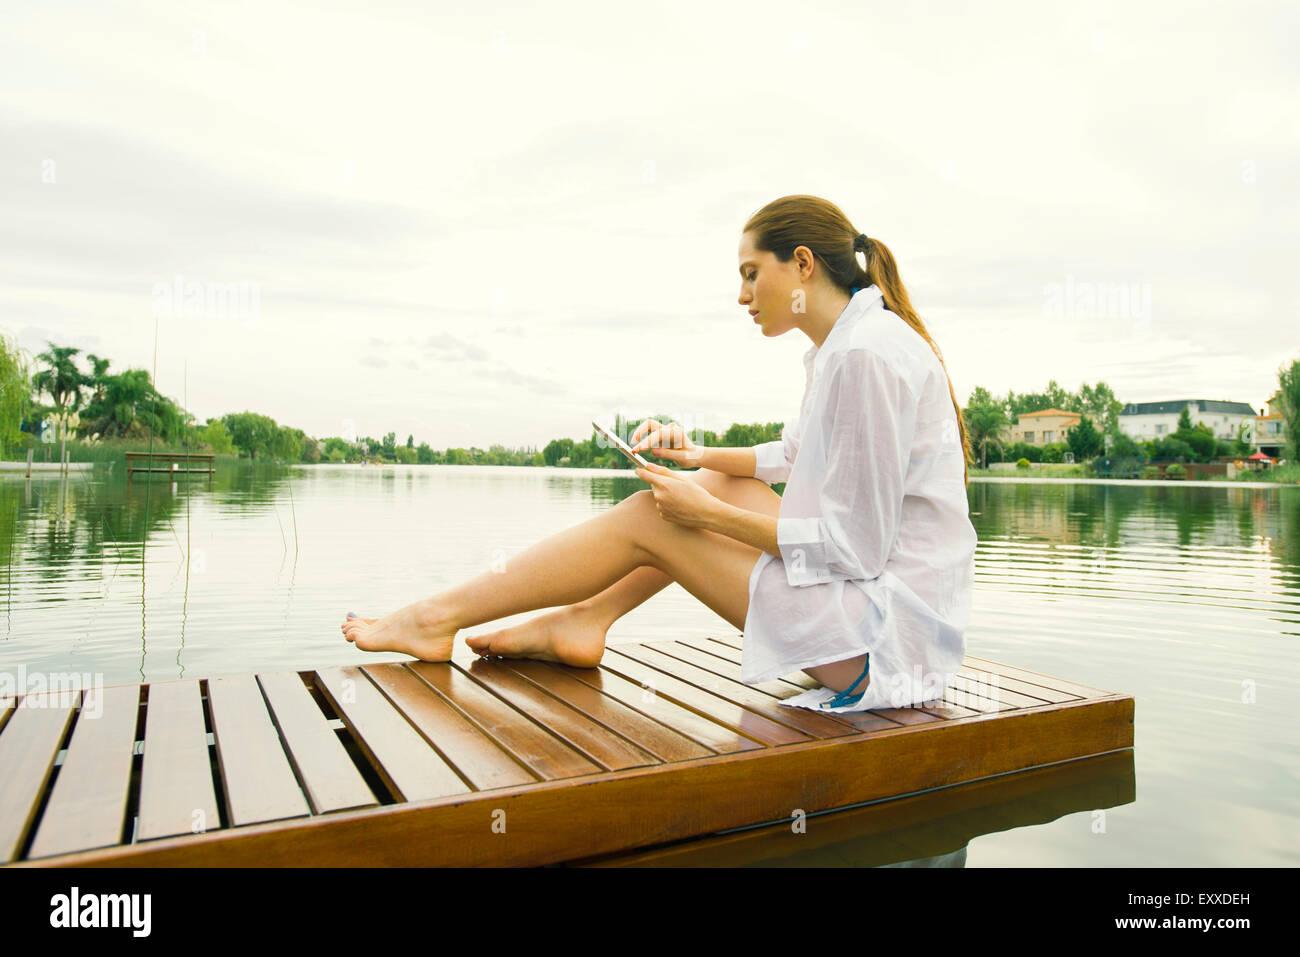 Woman relaxing on lake dock using digital tablet - Stock Image